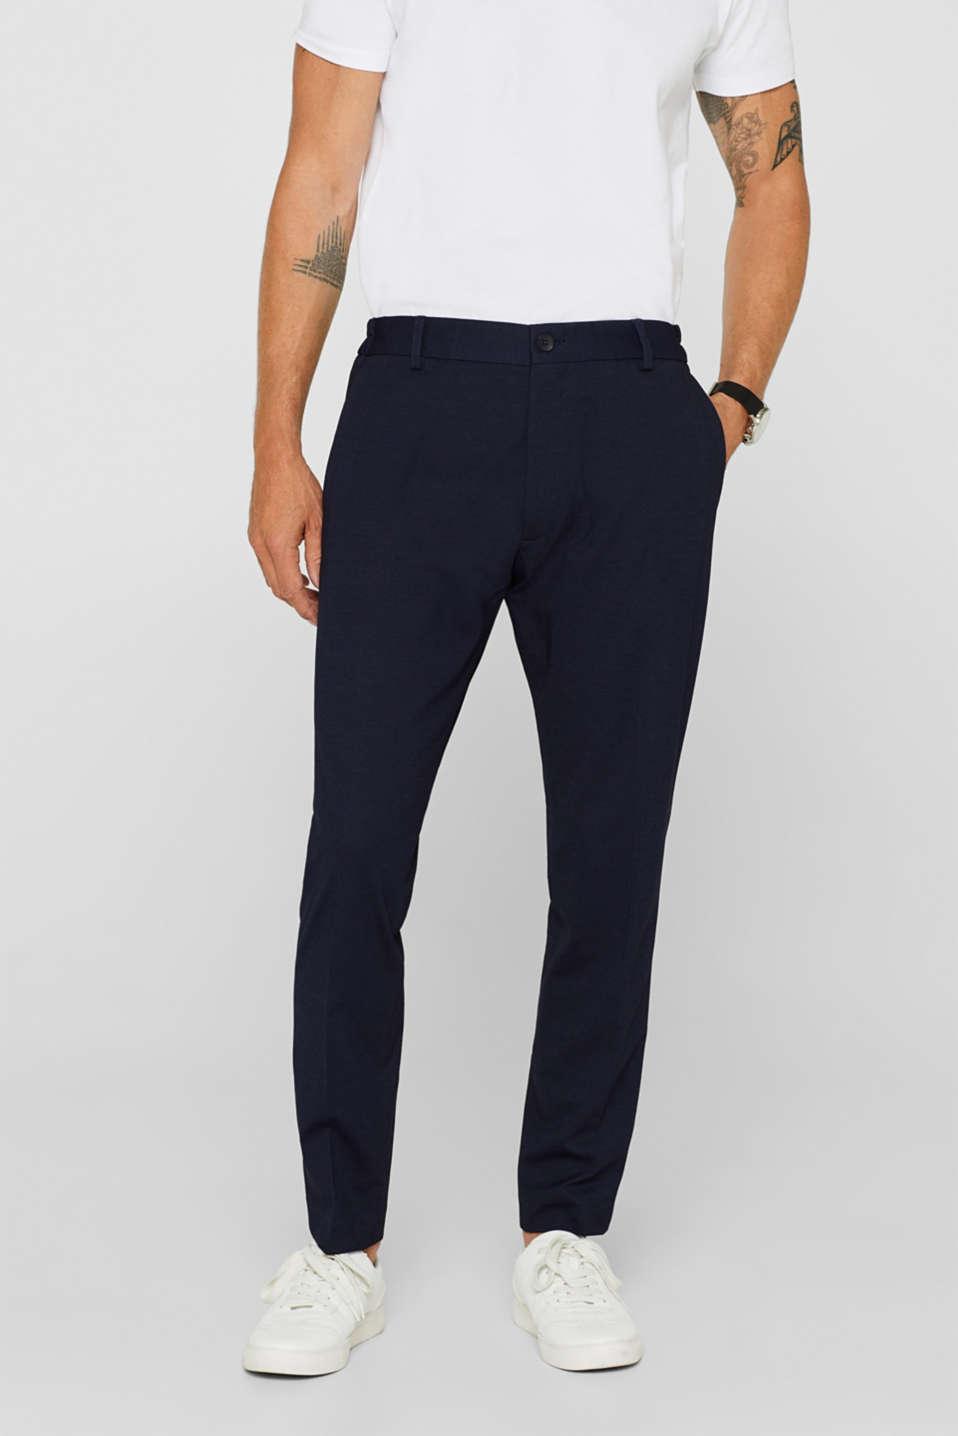 Pants suit, NAVY, detail image number 0